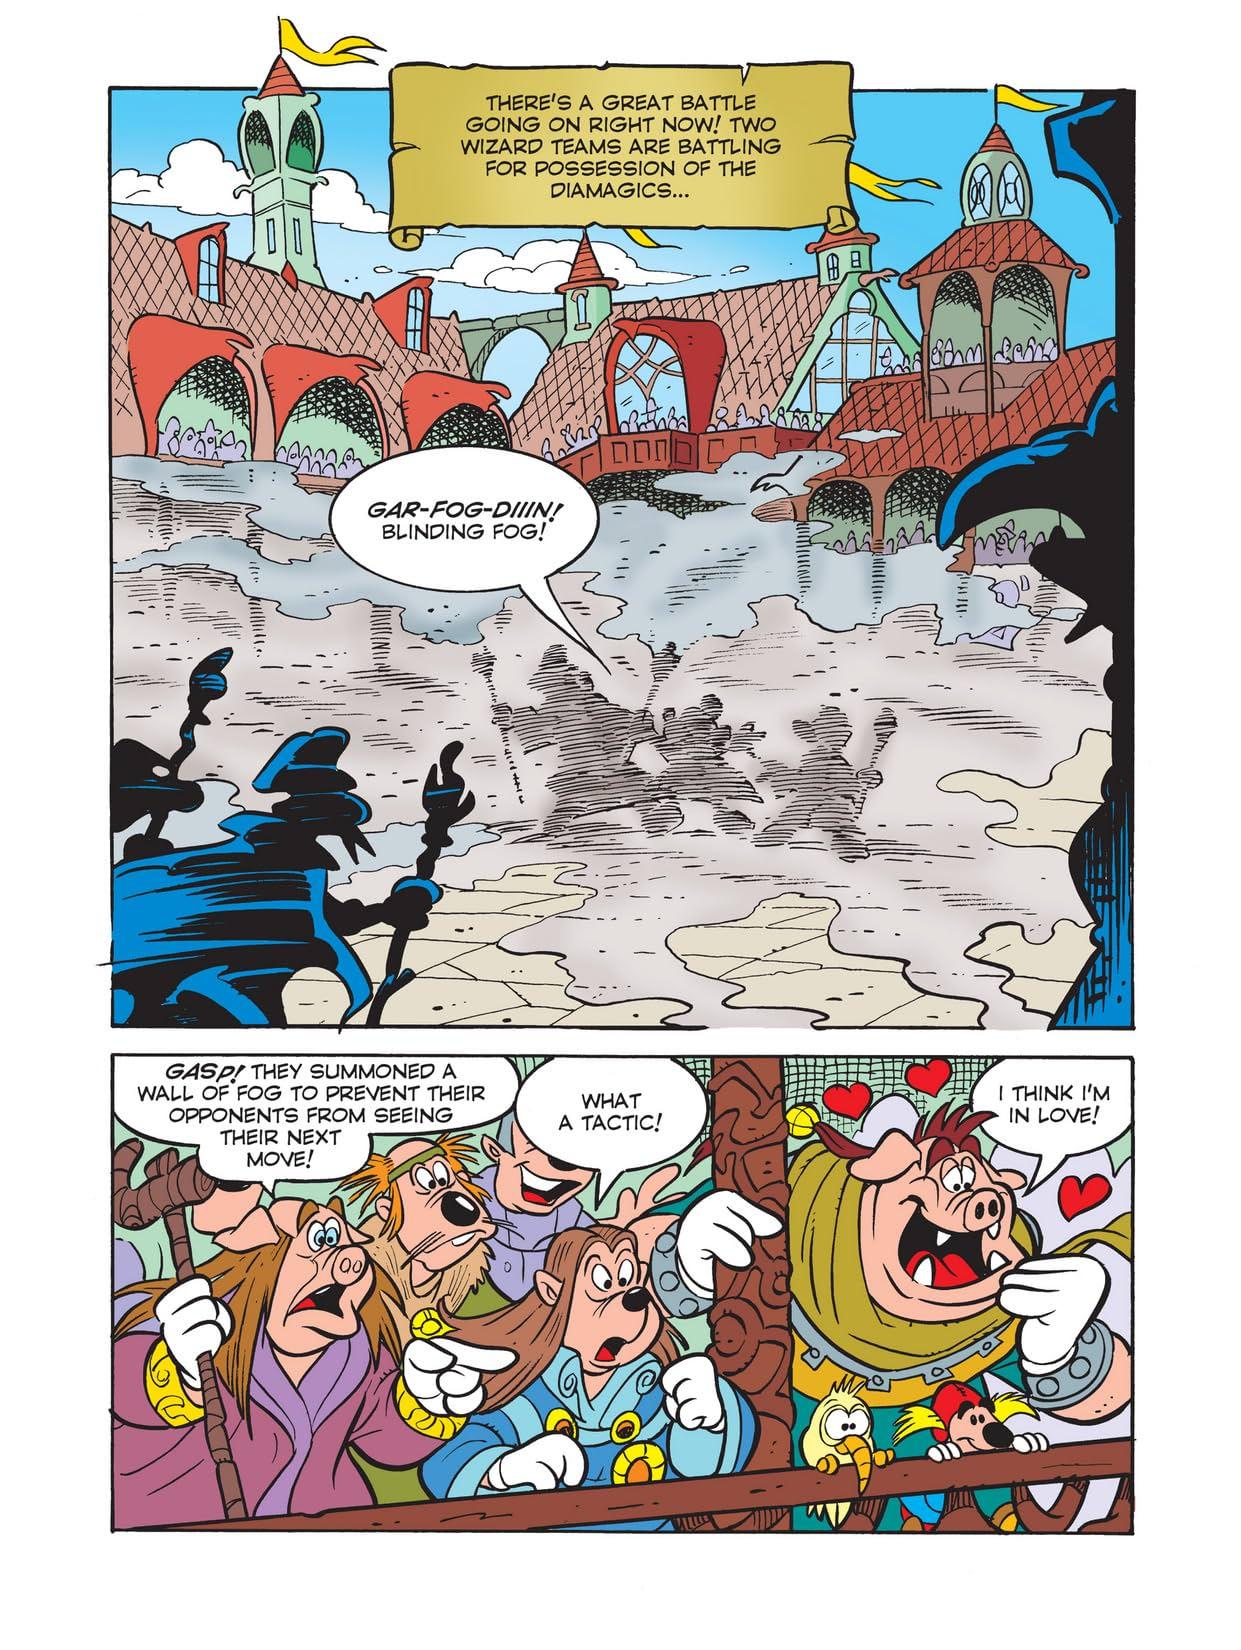 Wizards of Mickey #4: Diamond Moon